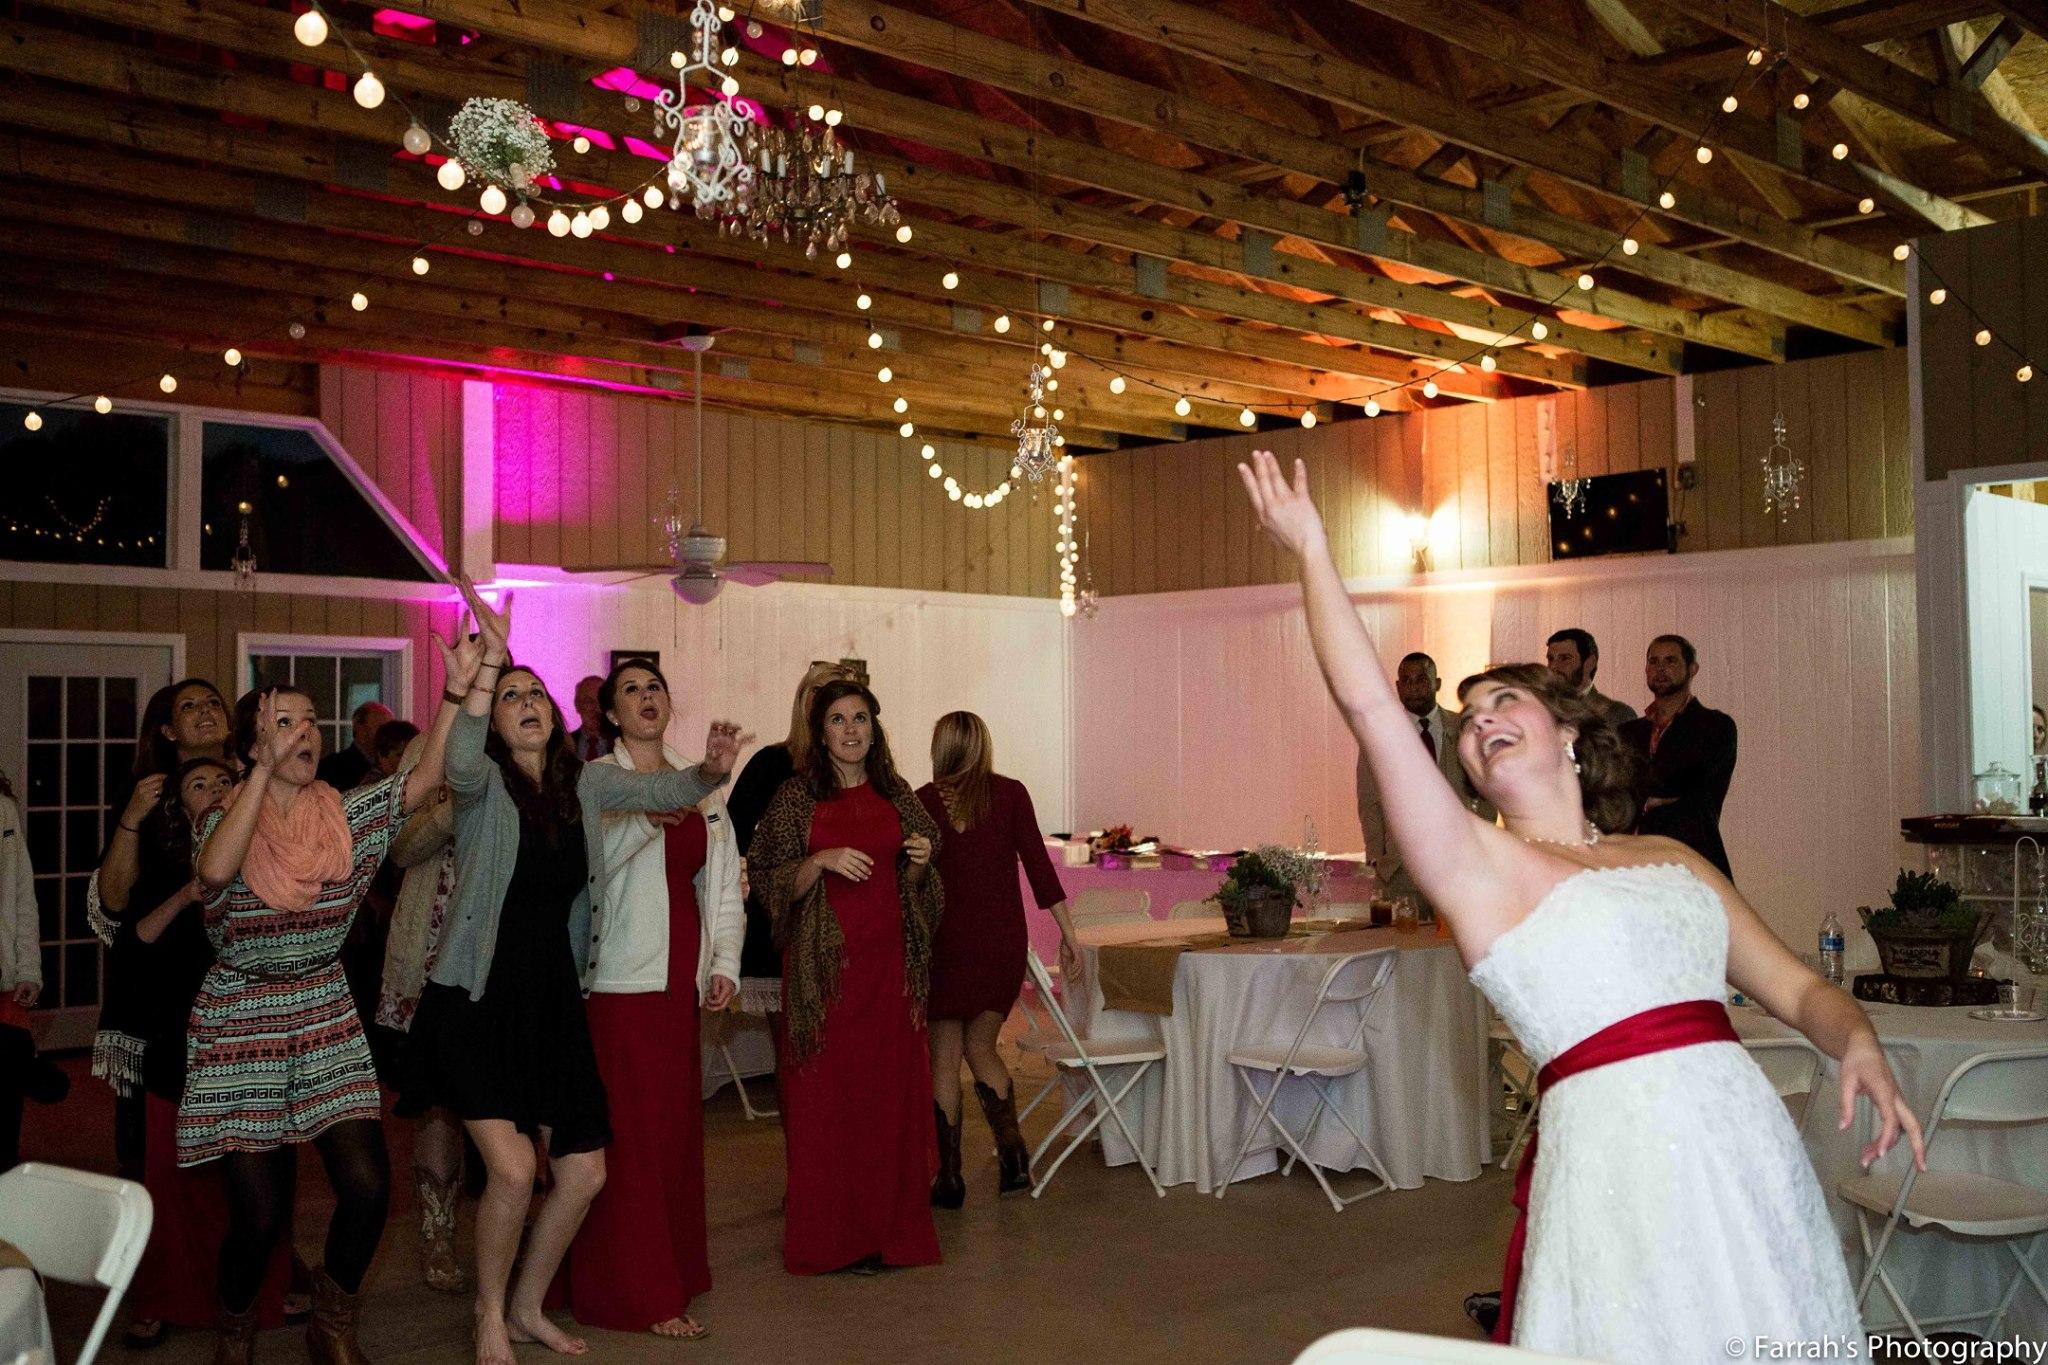 Knoxville Wedding DJ FAQ – Do You Provide Lighting